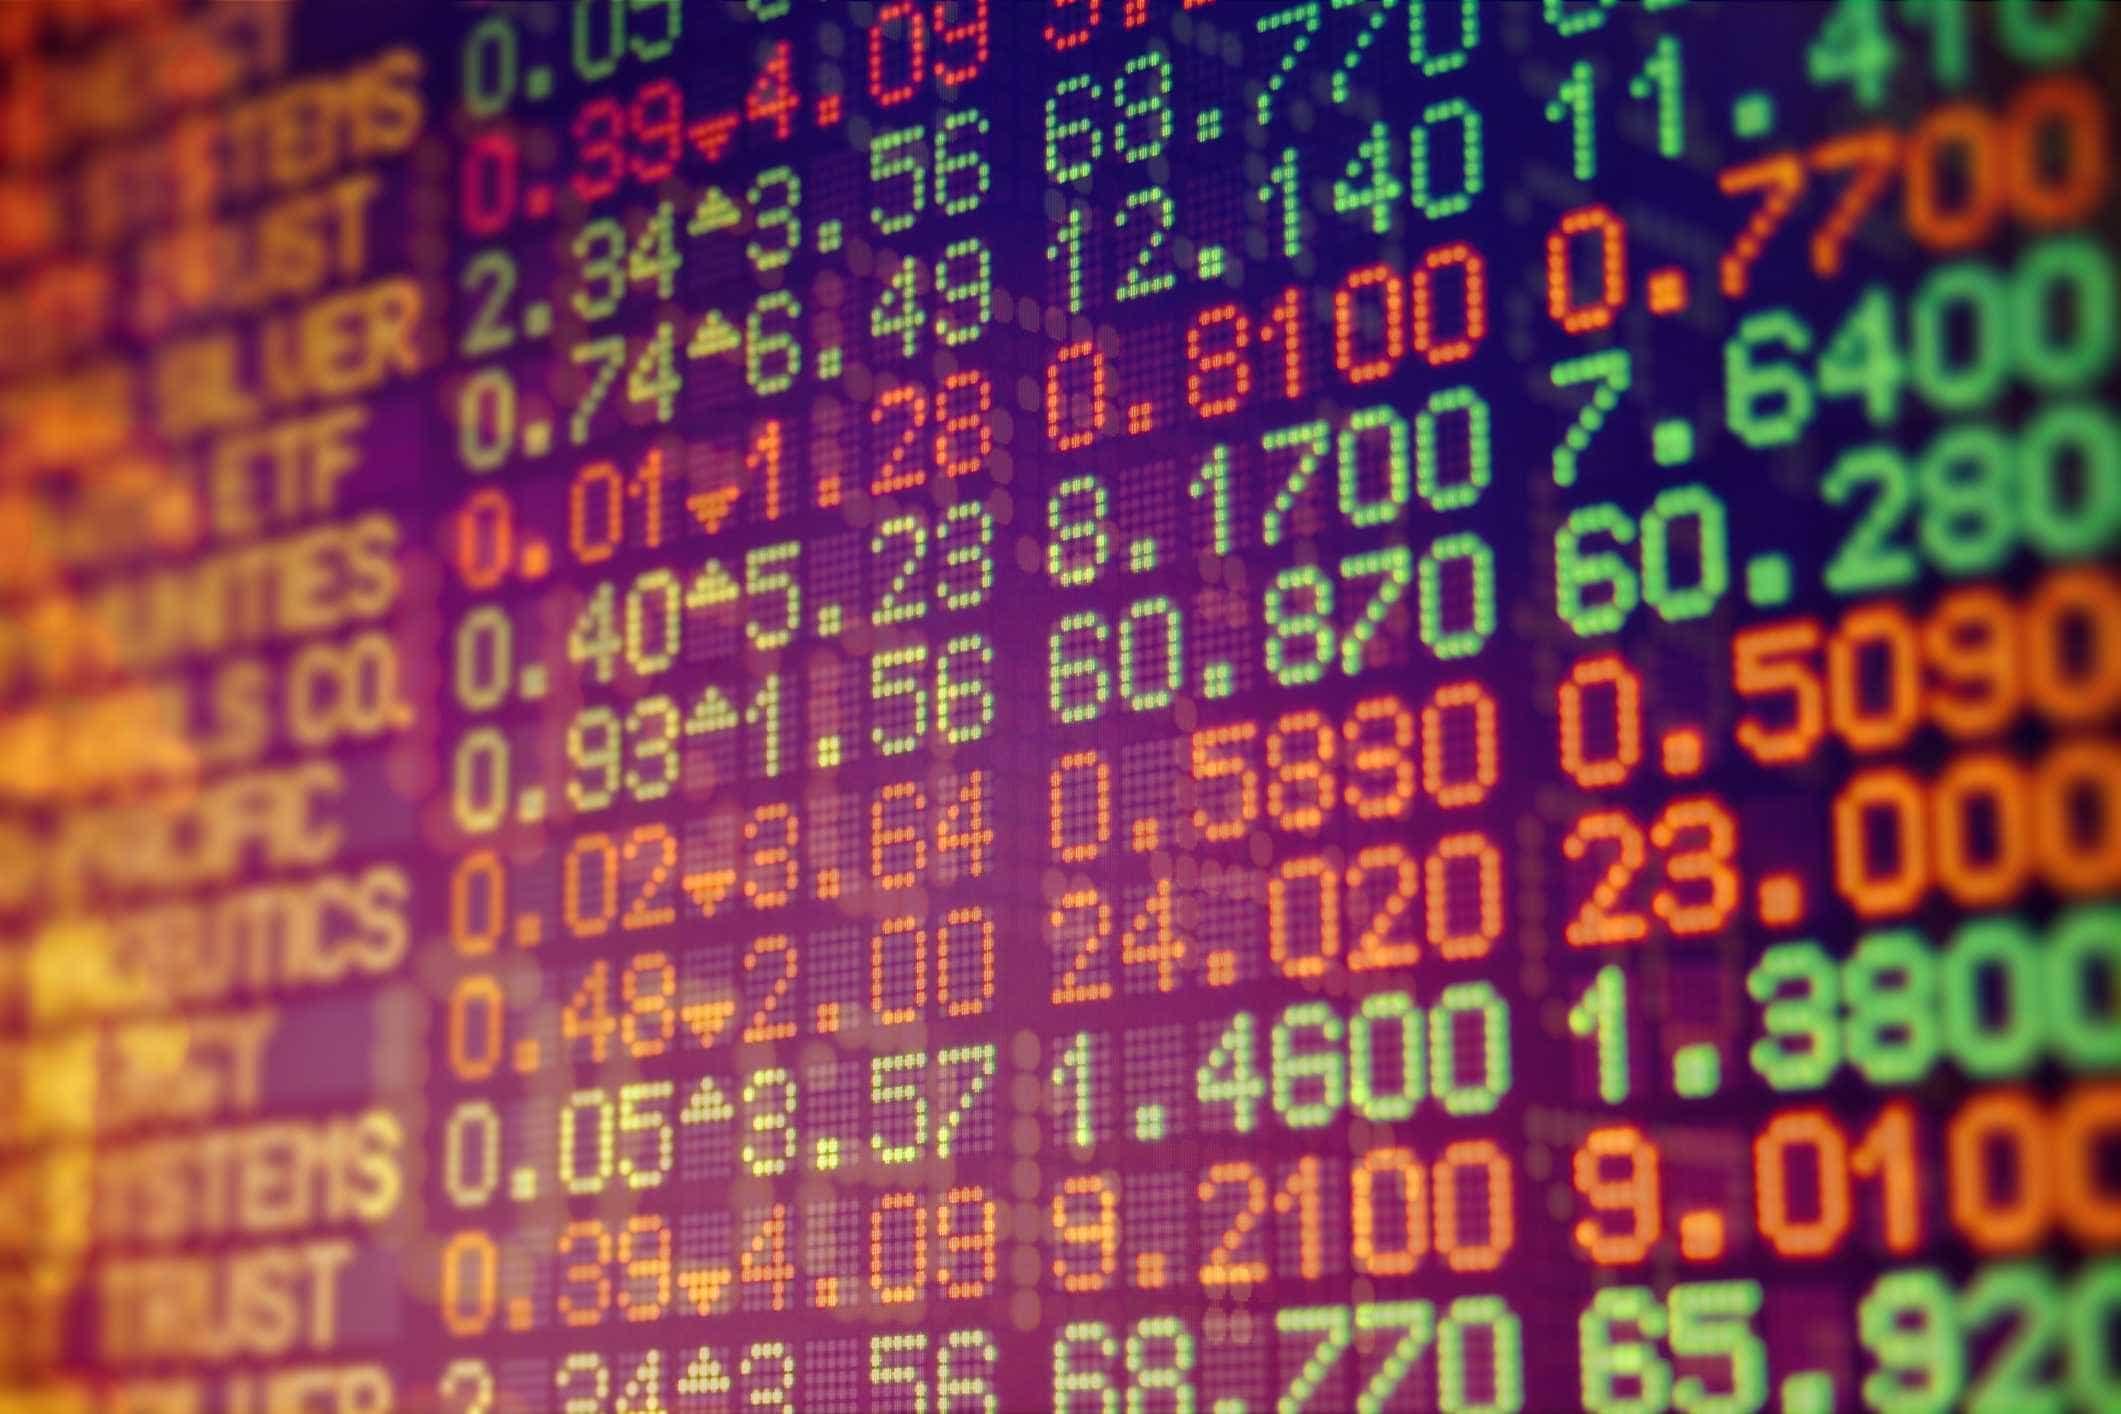 Bolsa de Tóquio perde 0,16% no fecho